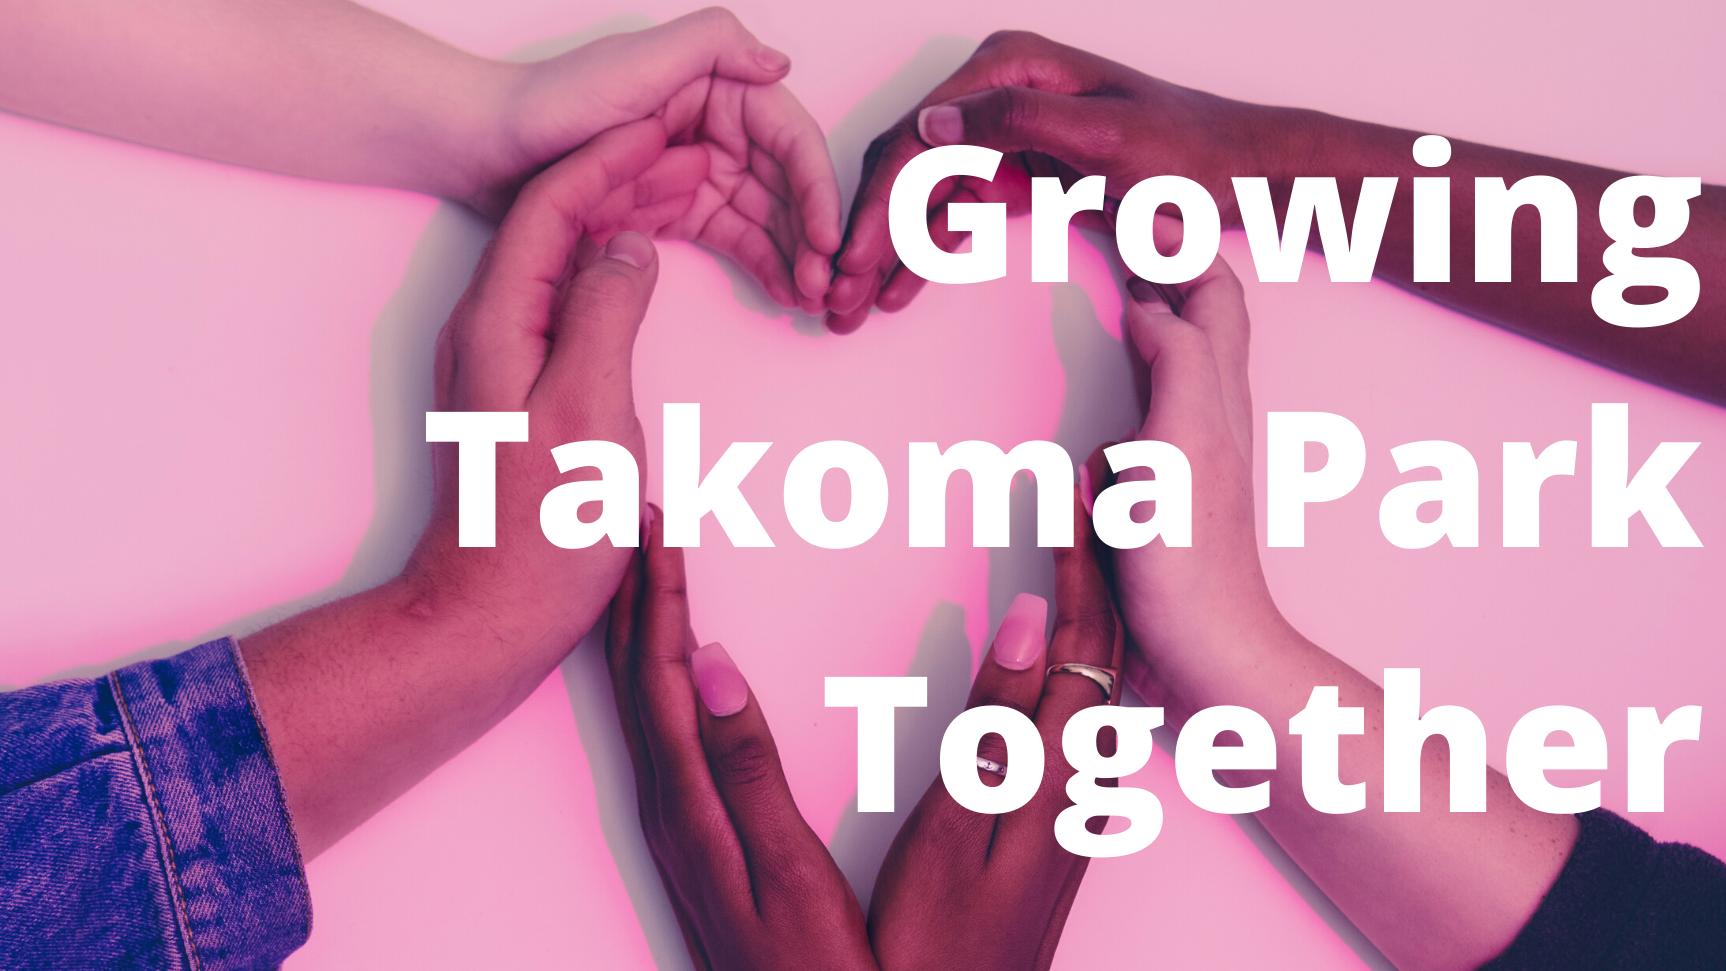 Growing Takoma Park Together!